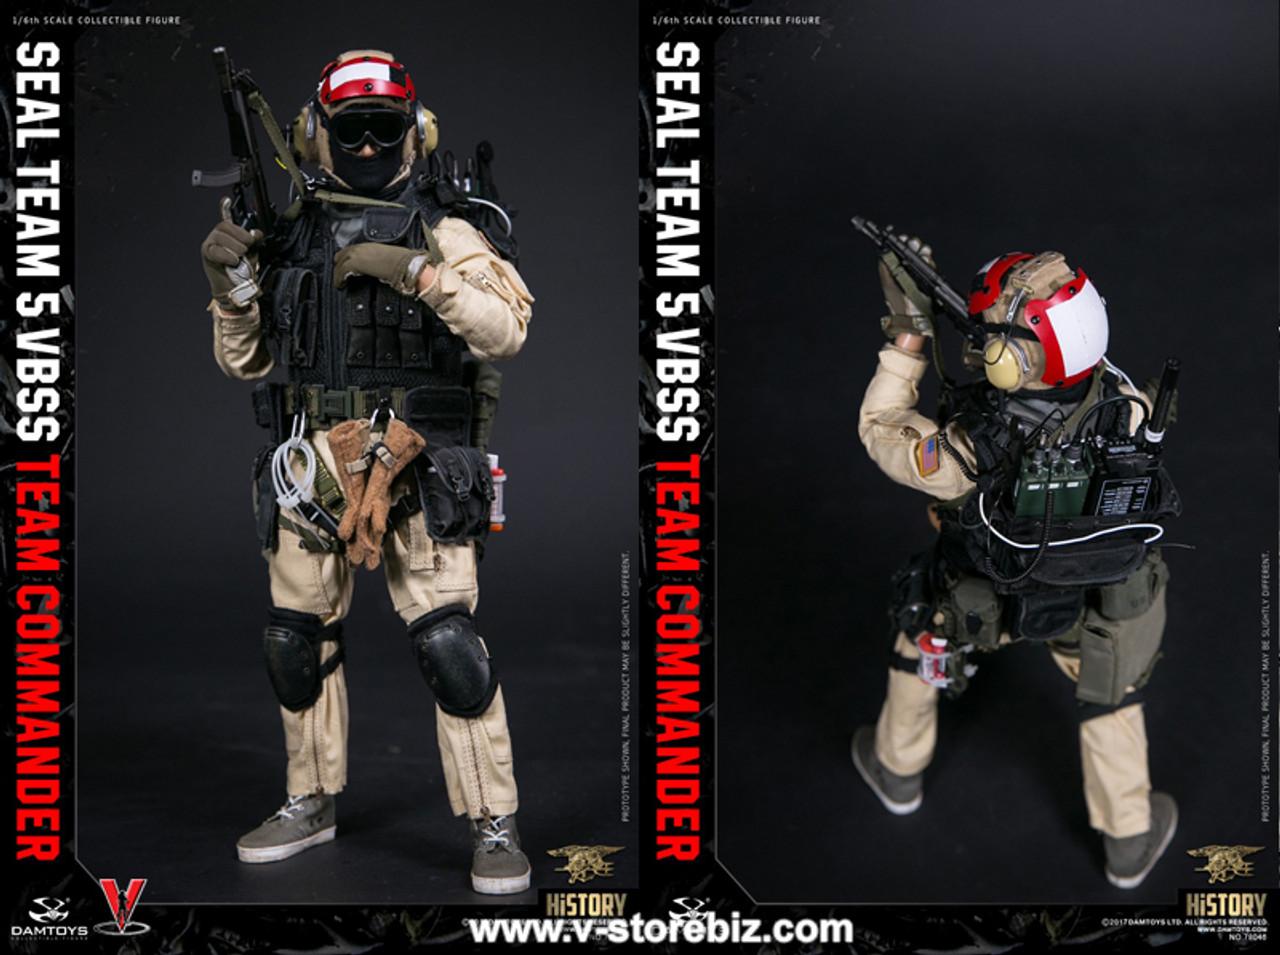 Damtoys Action Figures VBSS Team Commander MP5 Submachine Gun 1//6 Scale